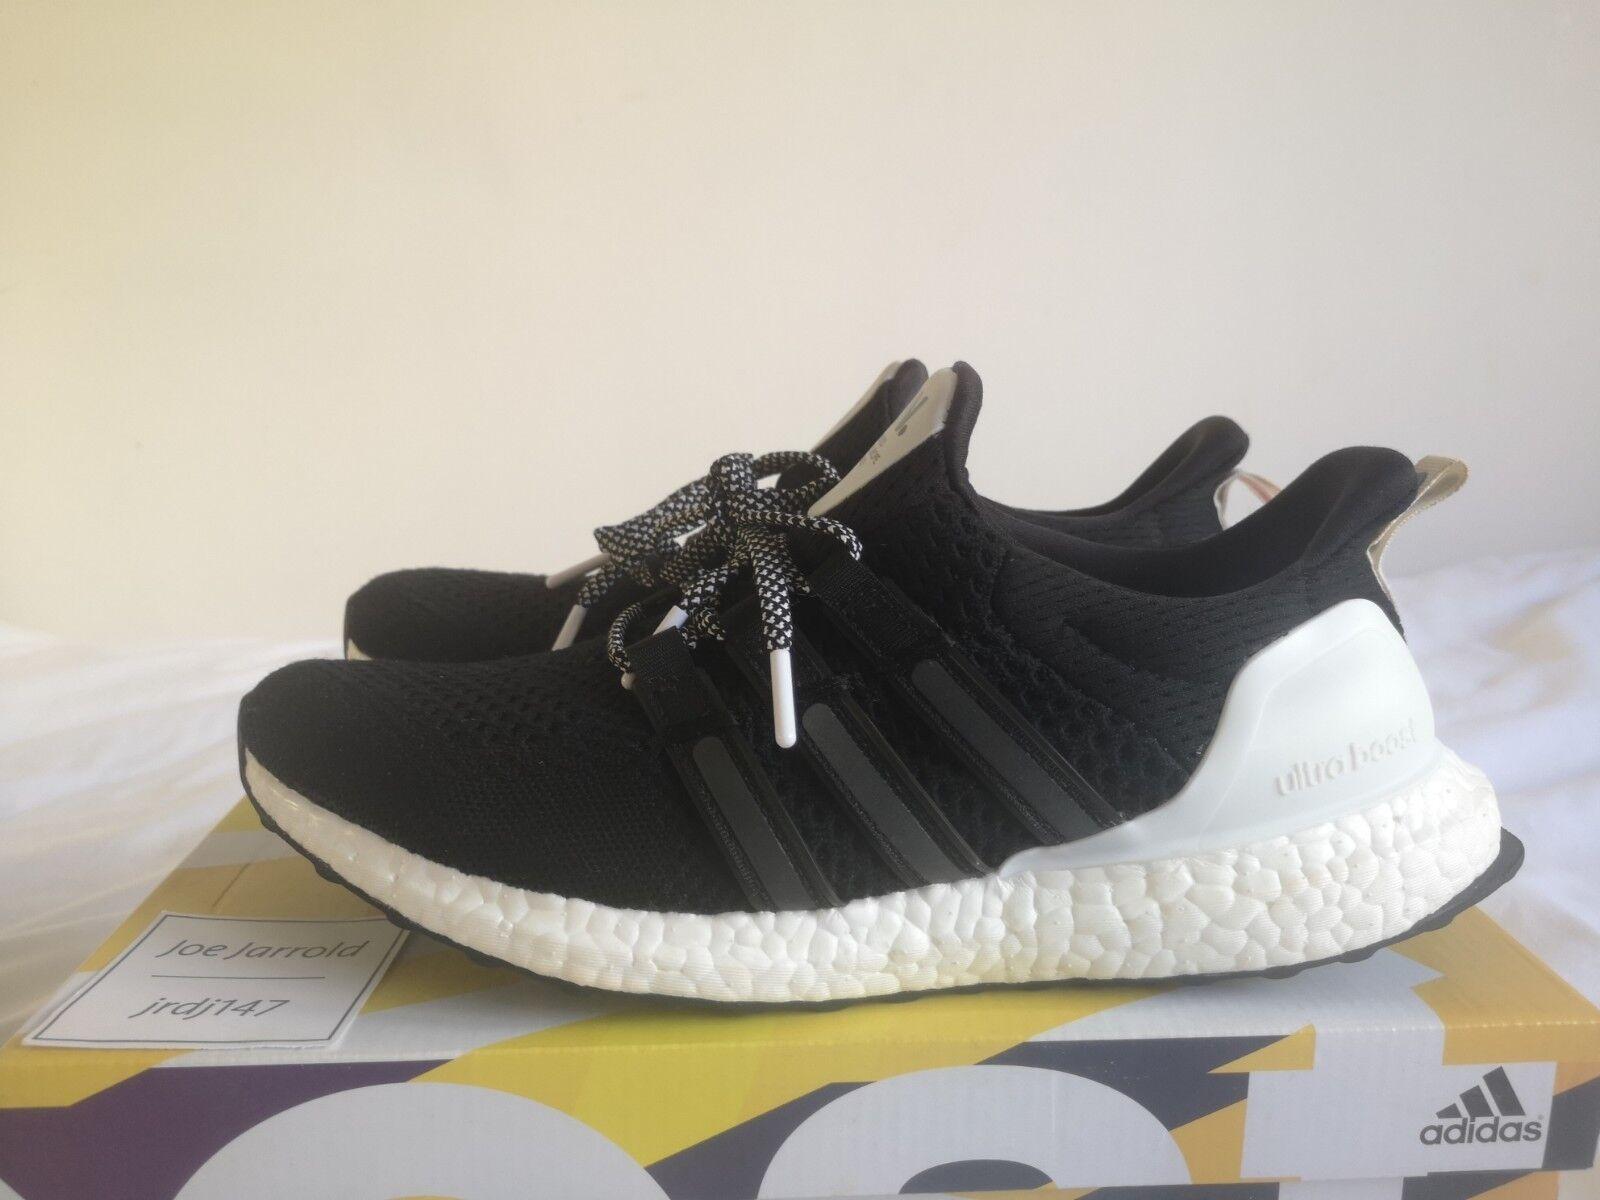 Adidas Ultra BOOST 1.0 - WOOD WOOD (AF5778)   UK8.5   US9